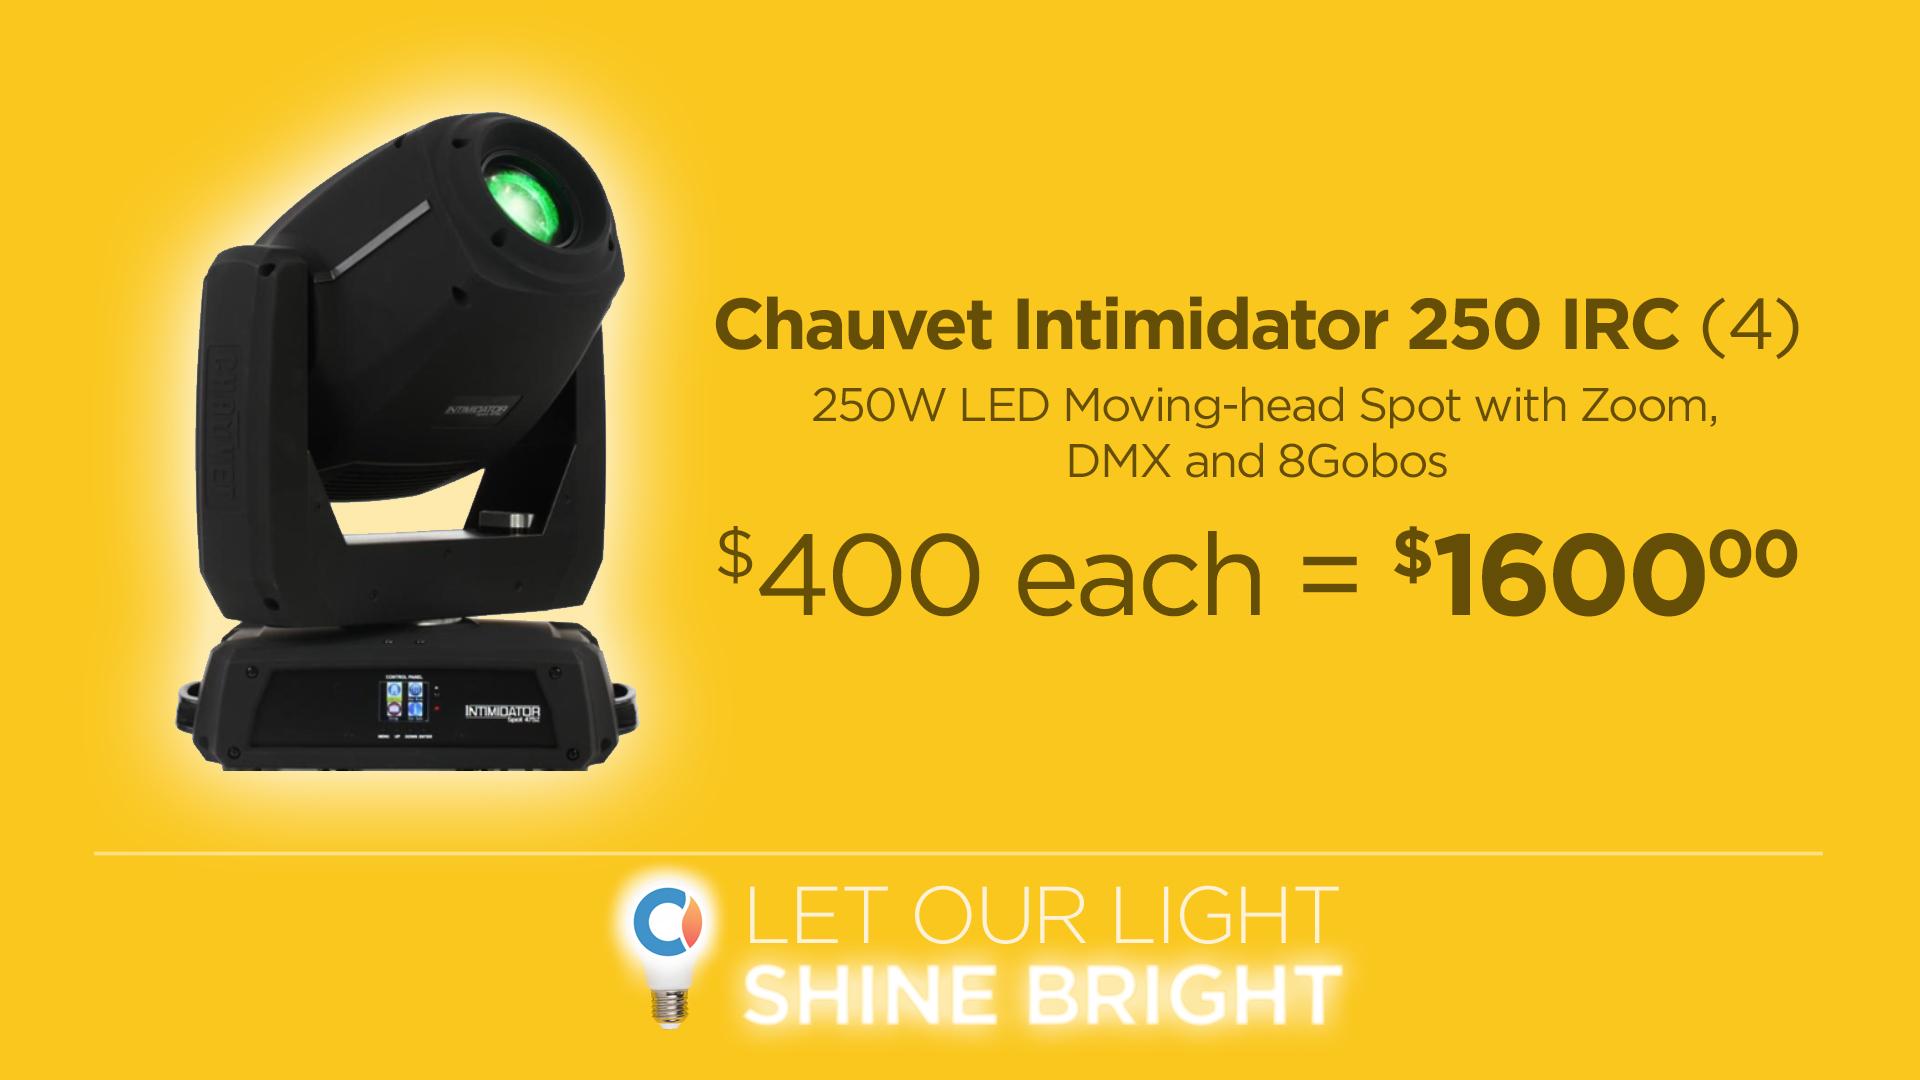 03-lighting-slide_chauvet-intimidator-250-irc